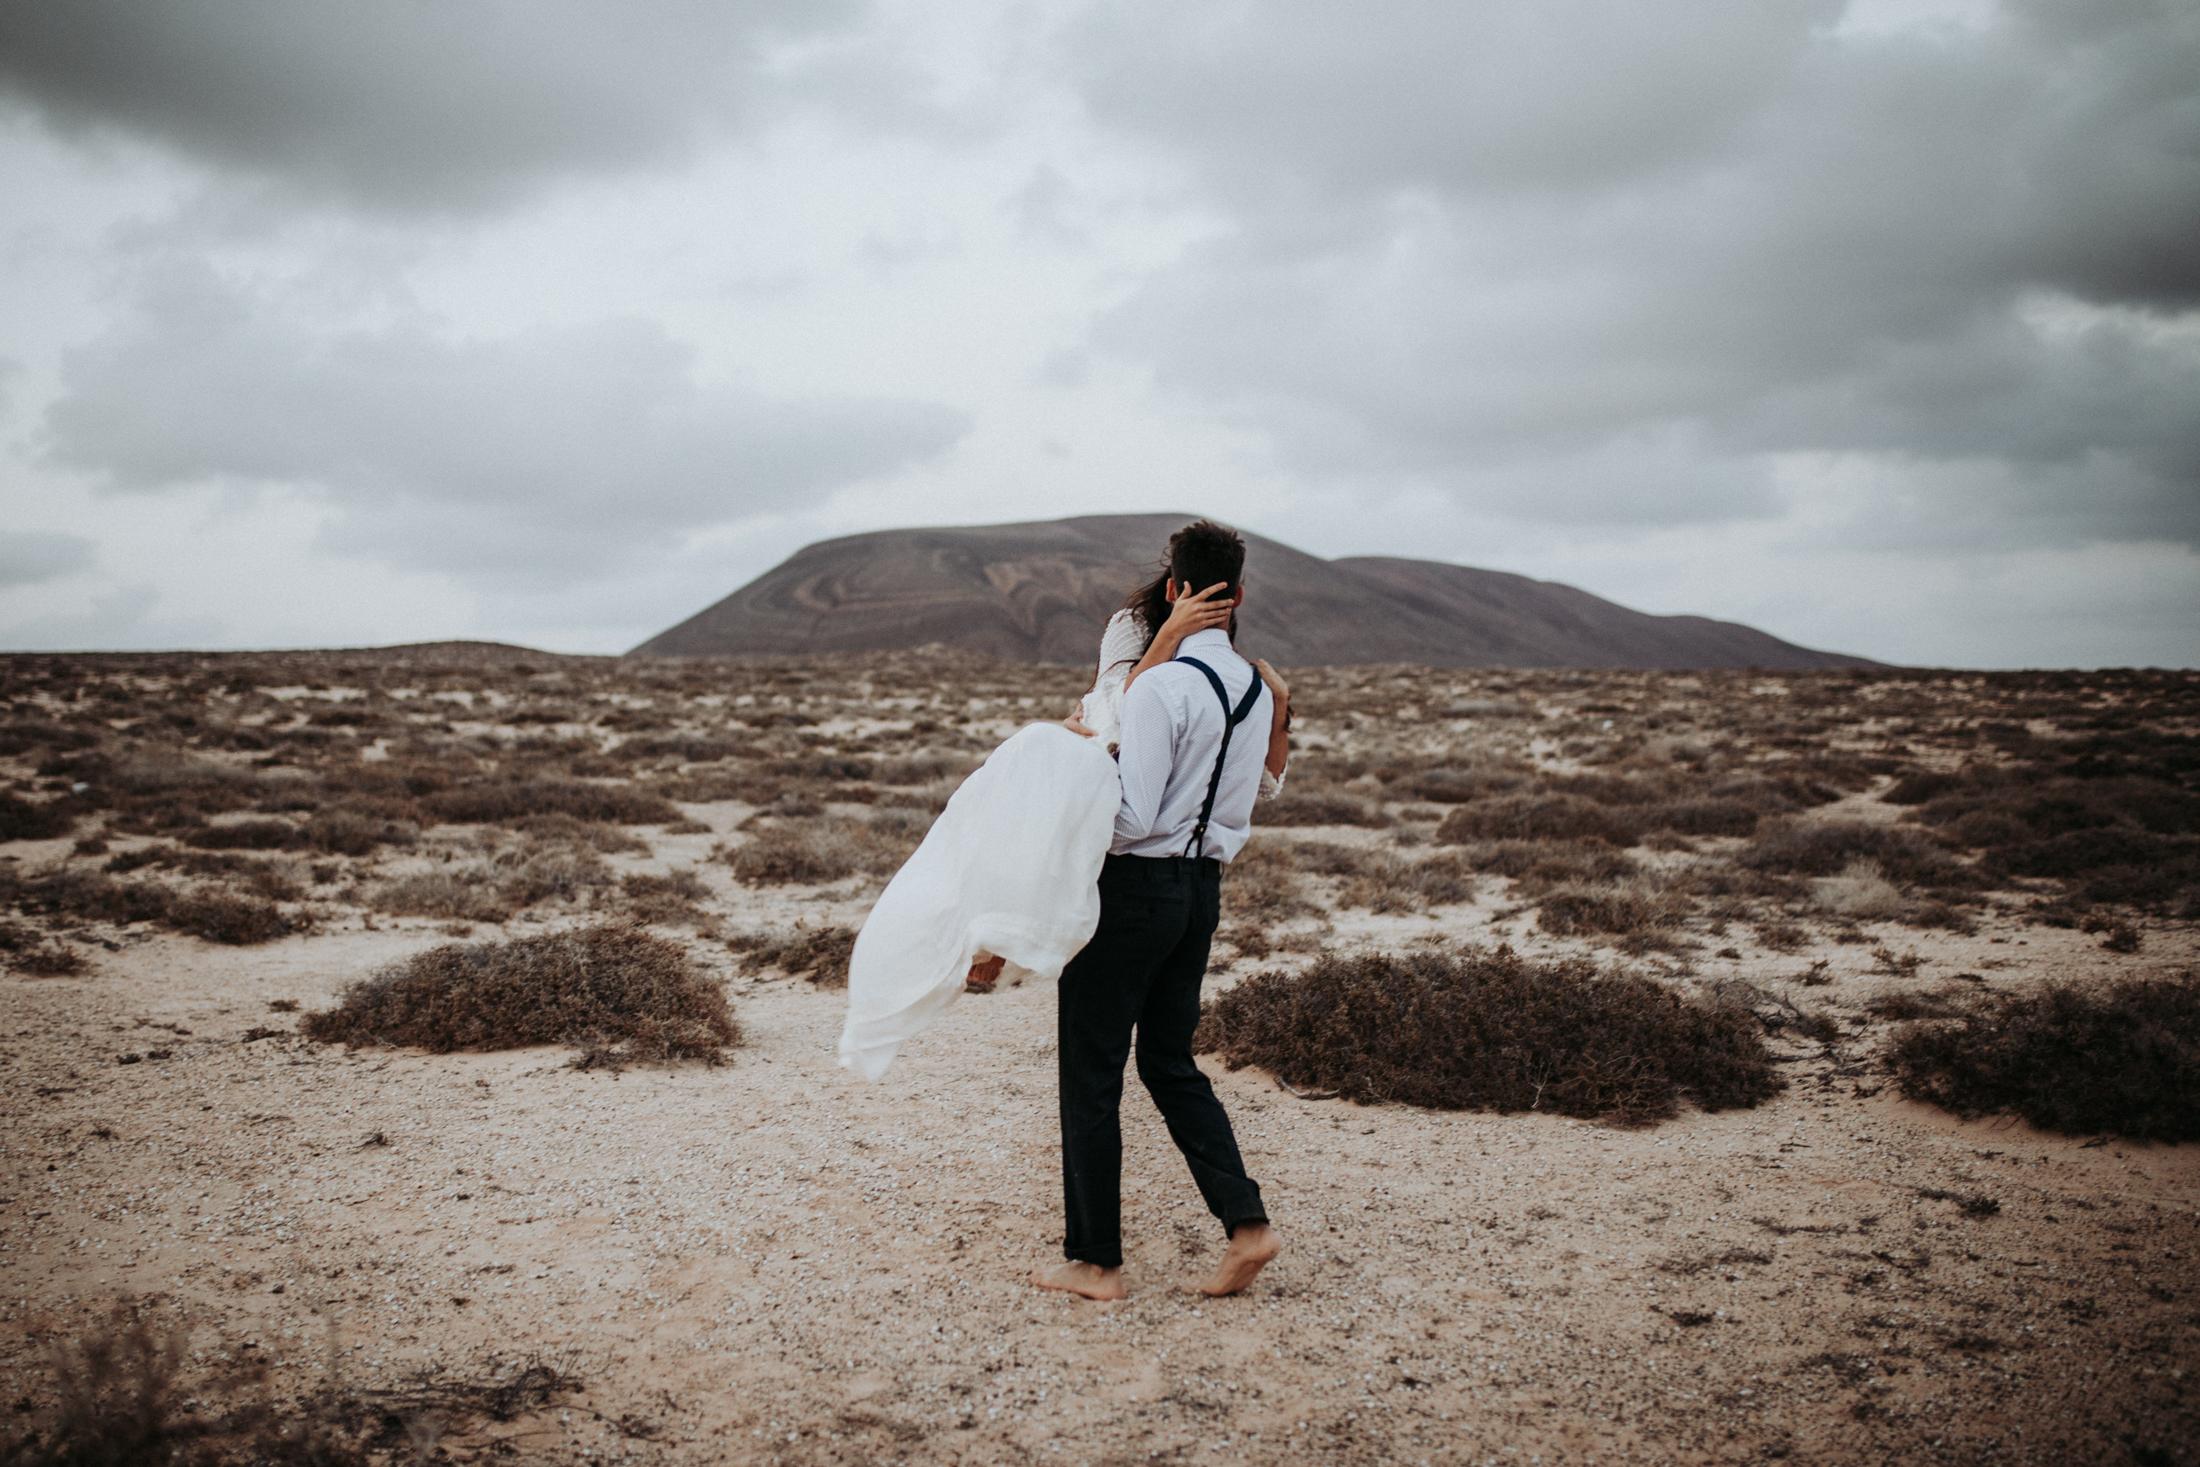 Wedding_Photographer_Mallorca_Daniela-Marquardt_Photography_CanaryIslands_Lanzarote_Iceland_Tuskany_Santorini_Portugal_Schweiz_Austria_Bayern_Elopement_Hochzeitsfotograf_30